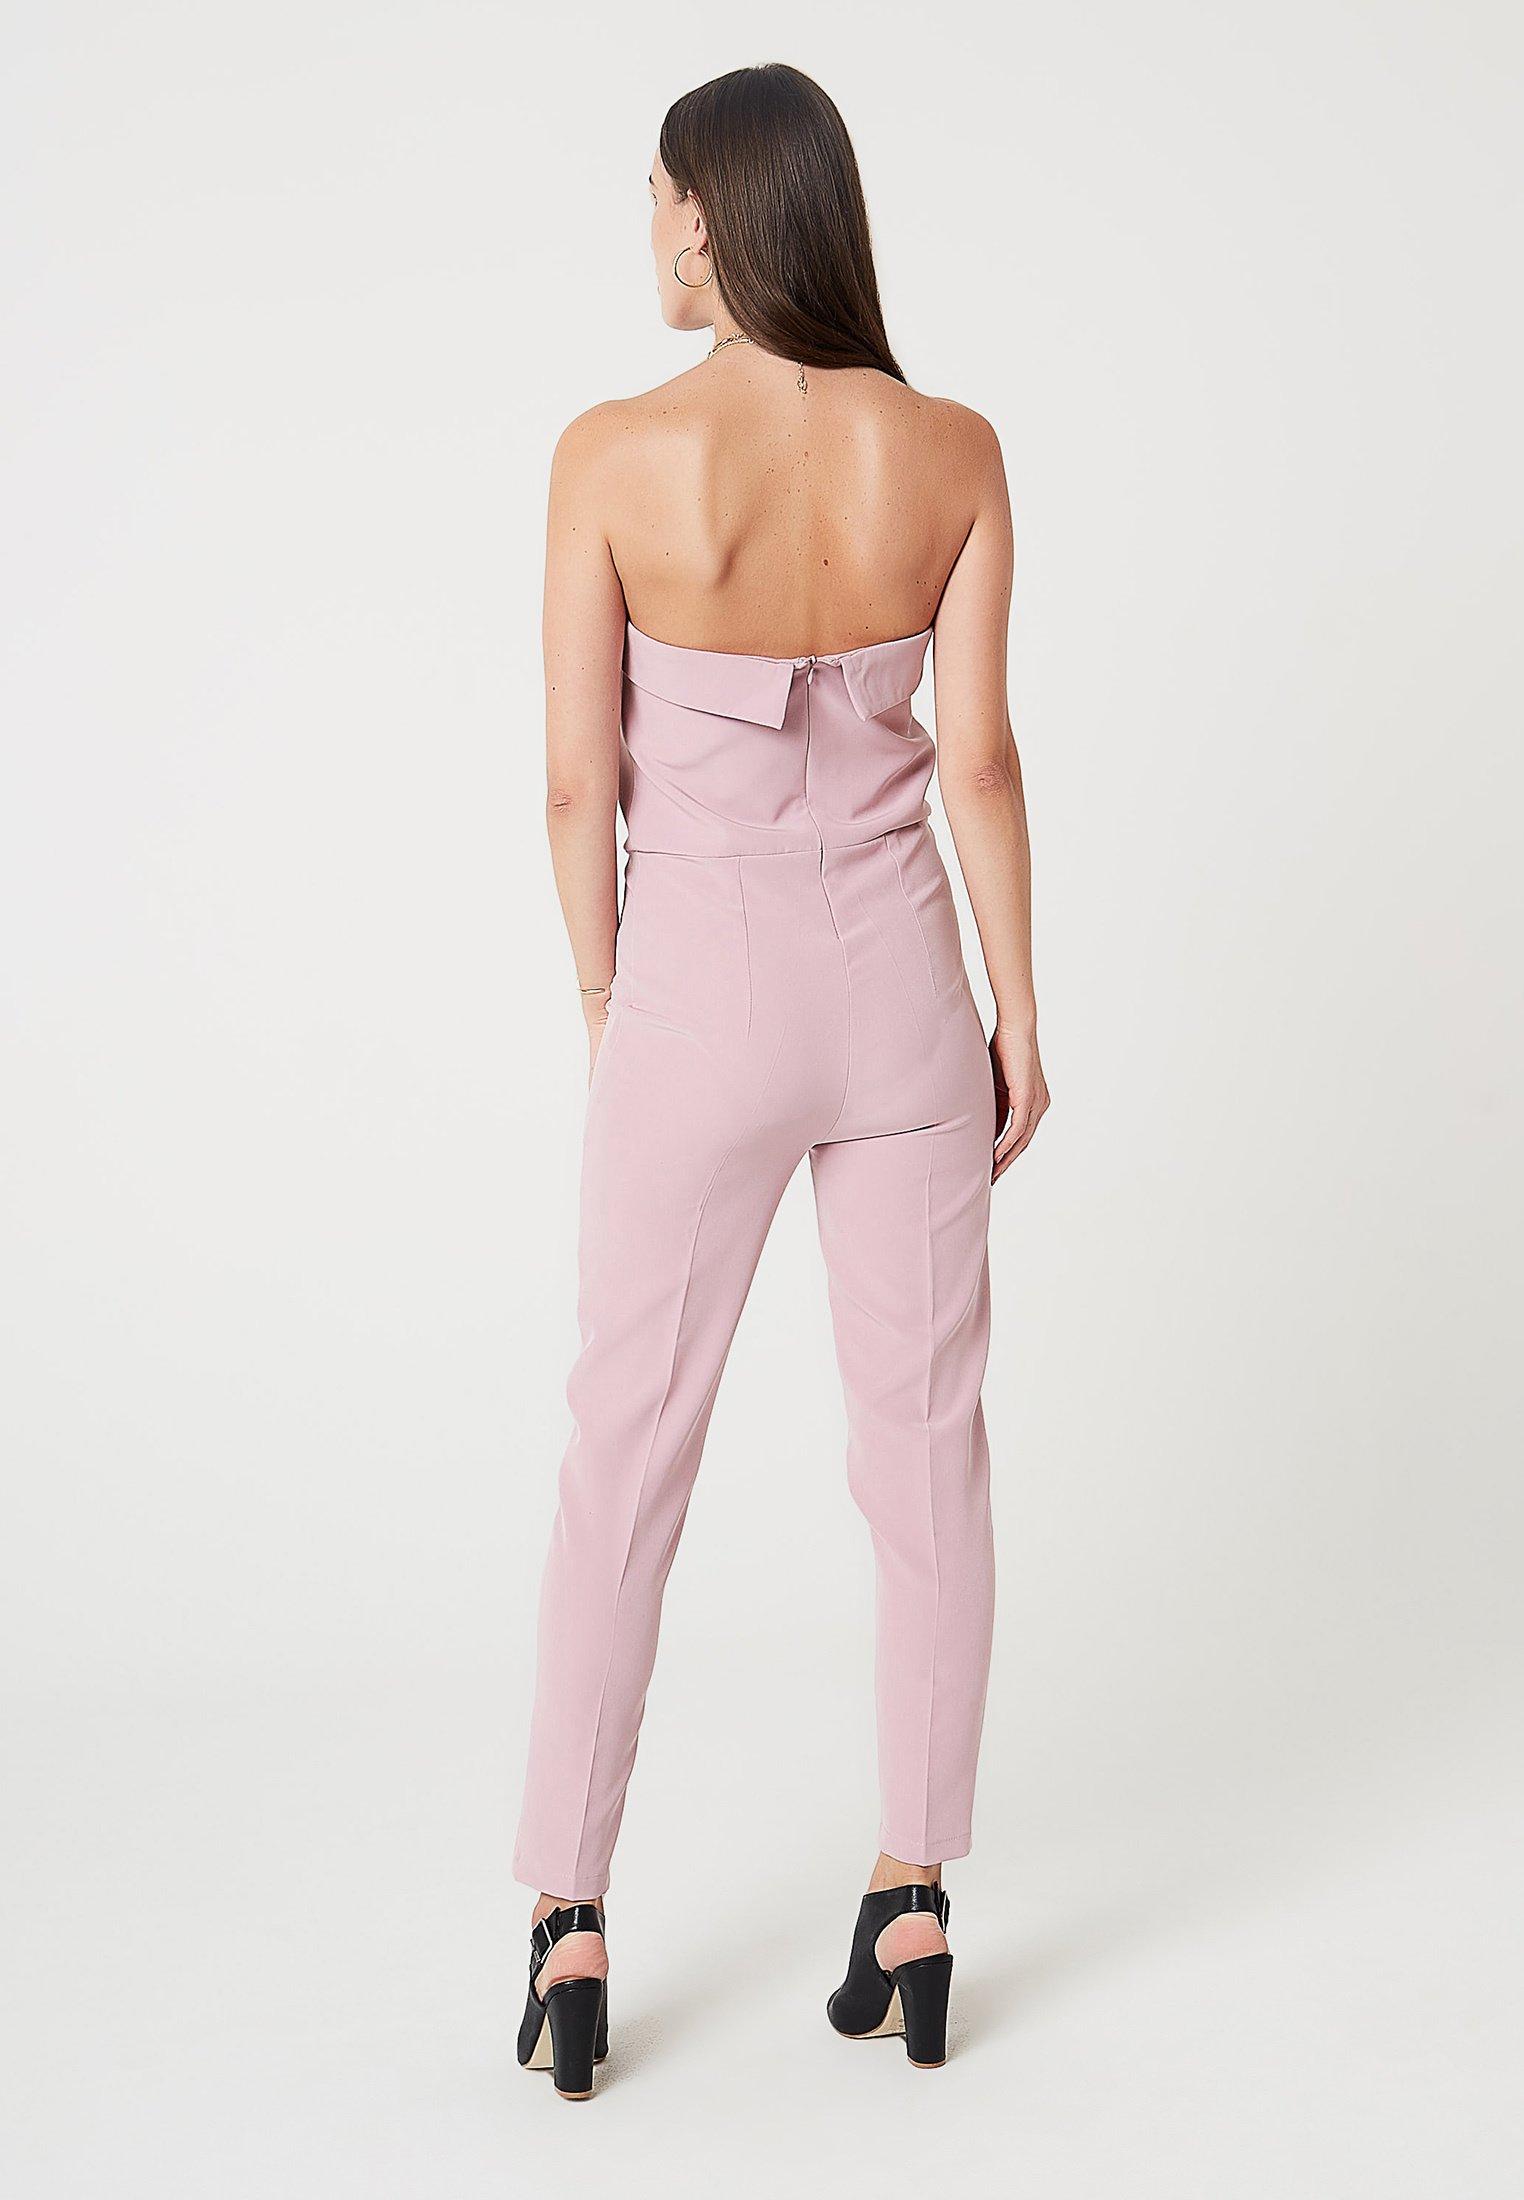 Cheapest Women's Clothing faina Jumpsuit rose cfqew67Mj